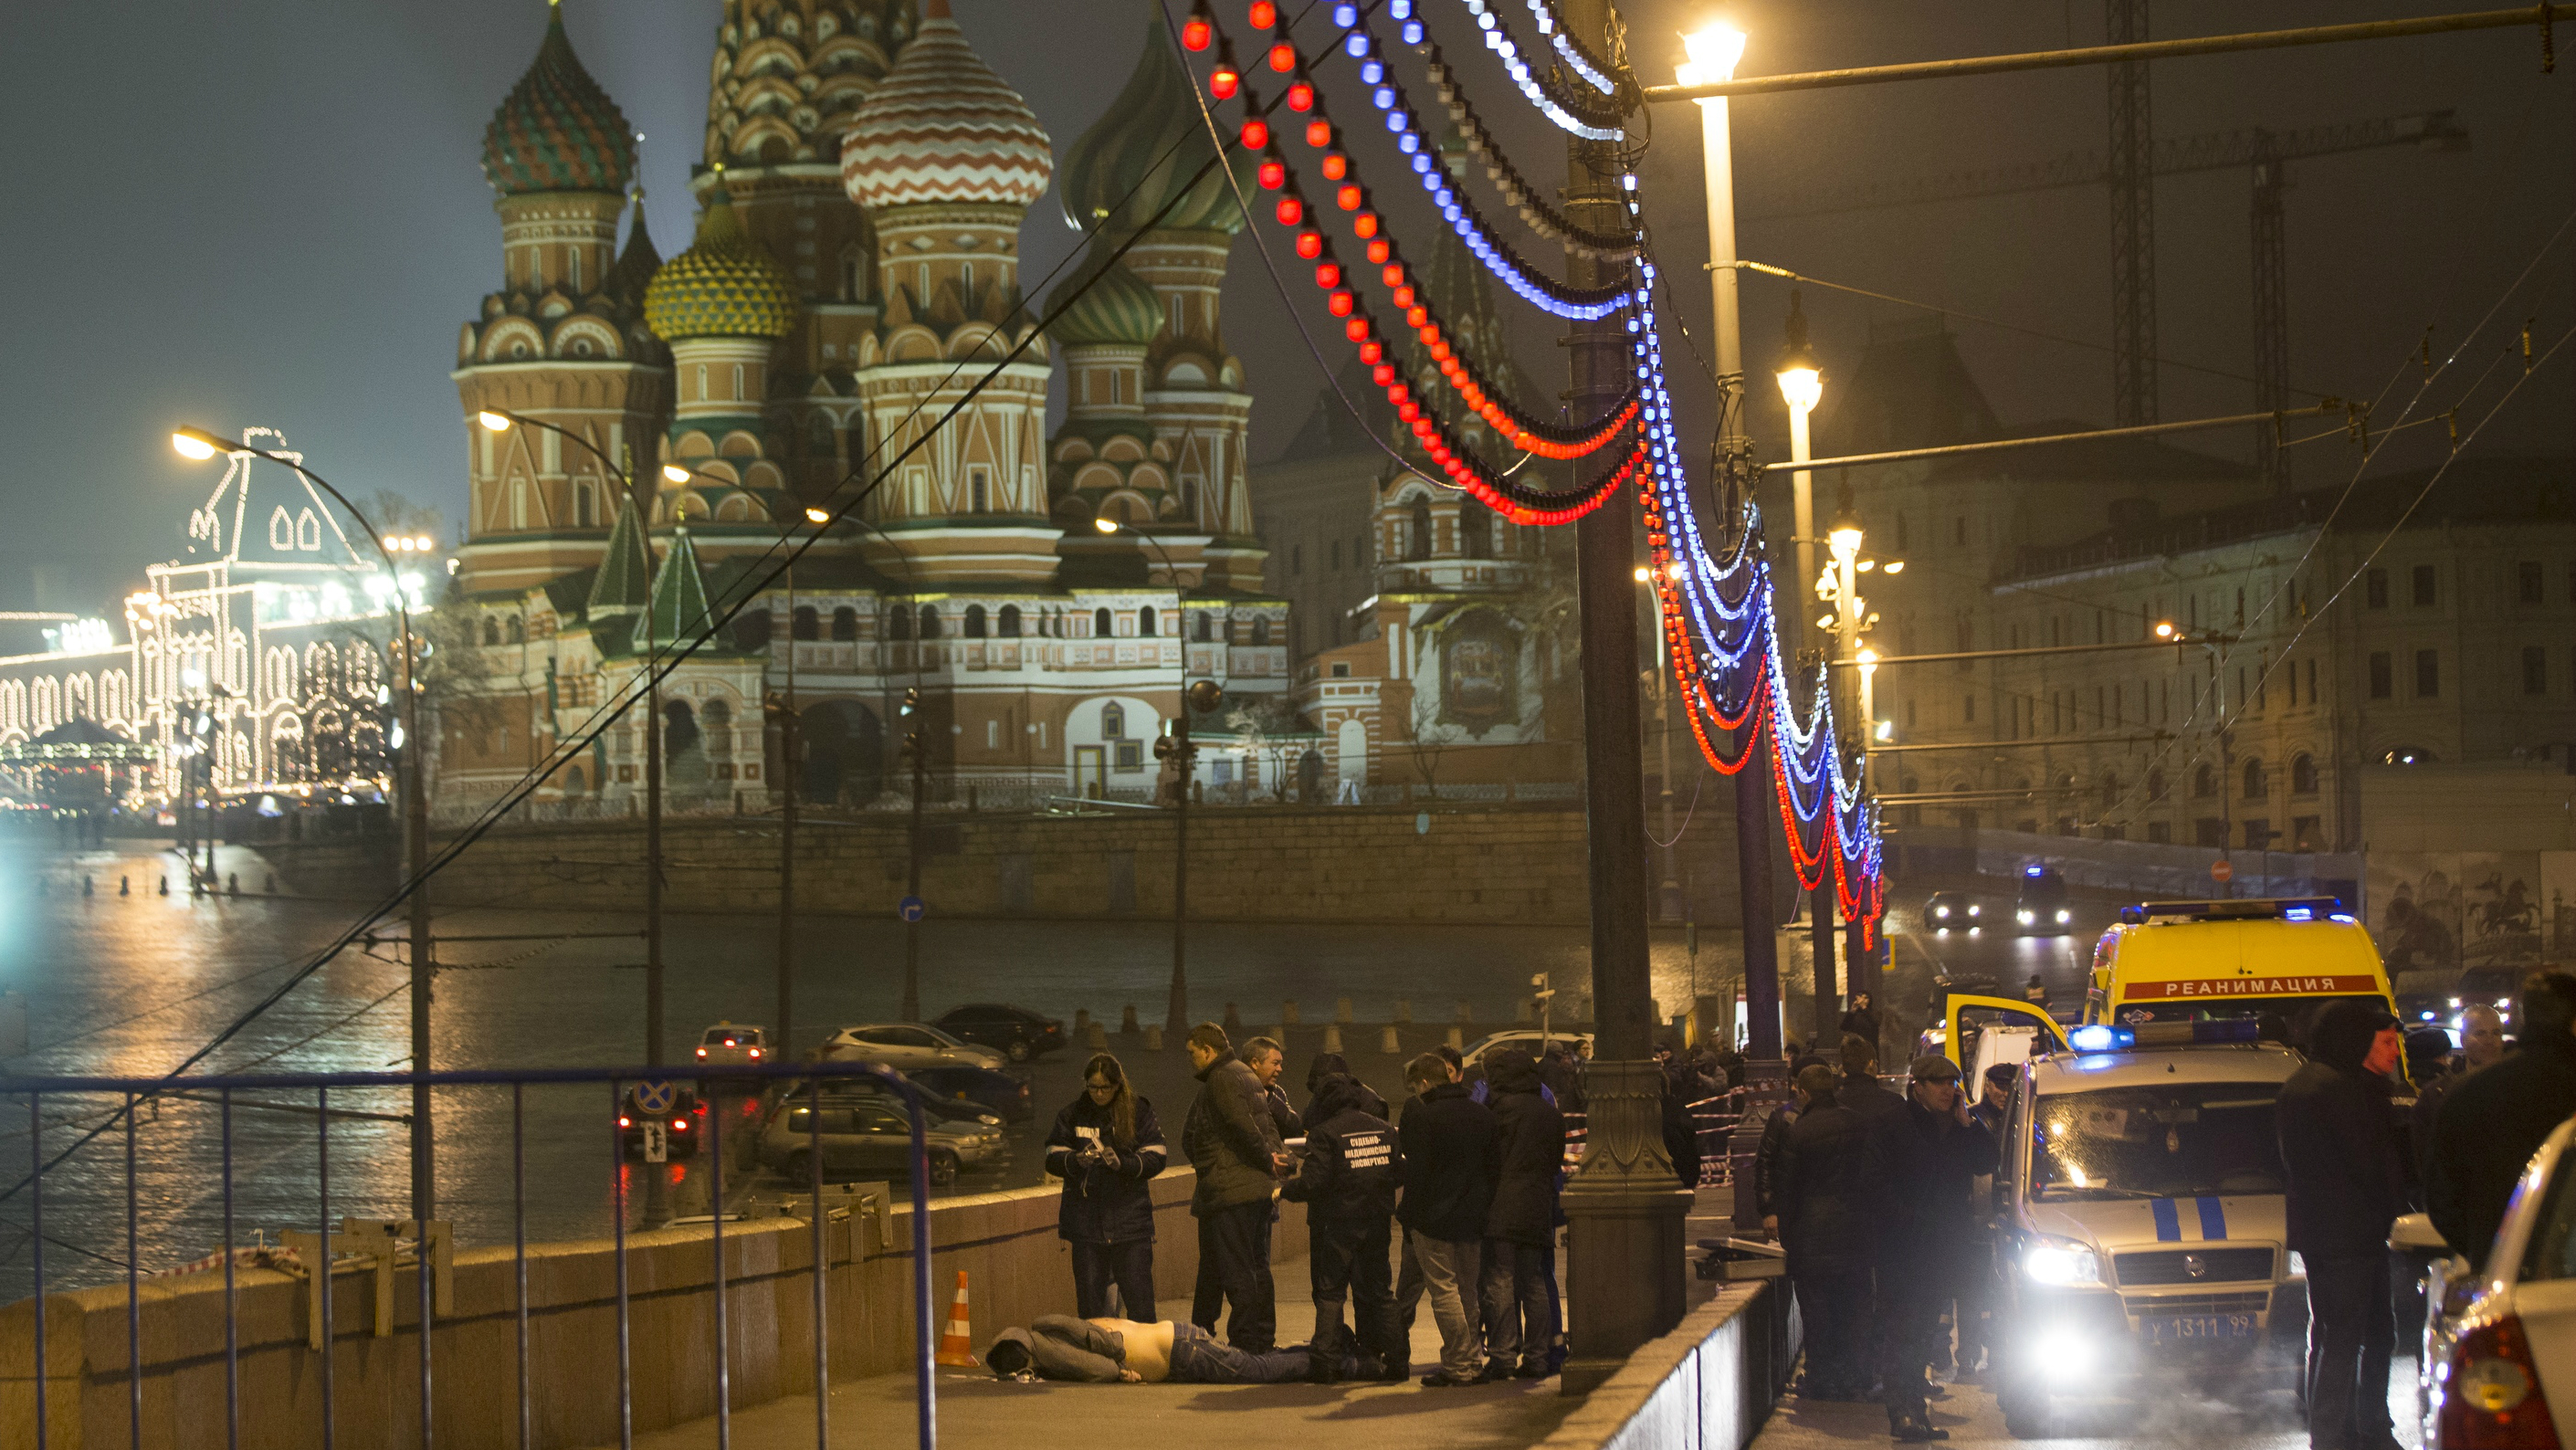 Boris Nemtsov's body in the shadow of St. Basil Cathidral.